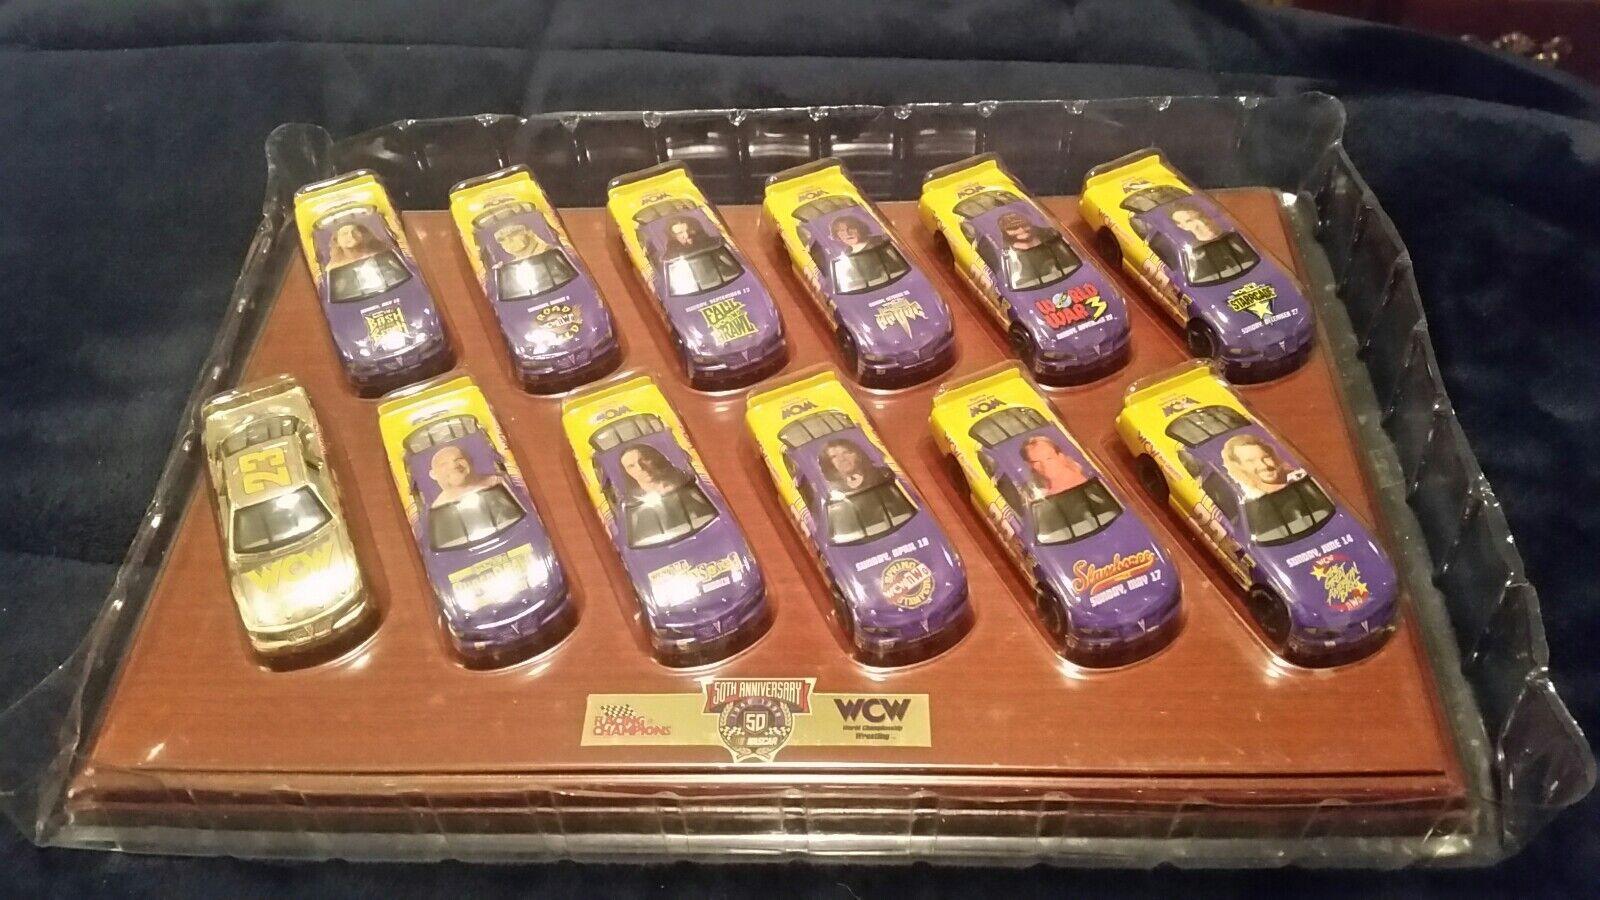 1998 Racing Champions WCW 12 12 12 Car Set 50th Anniversary Nascar 1 64 6fed09